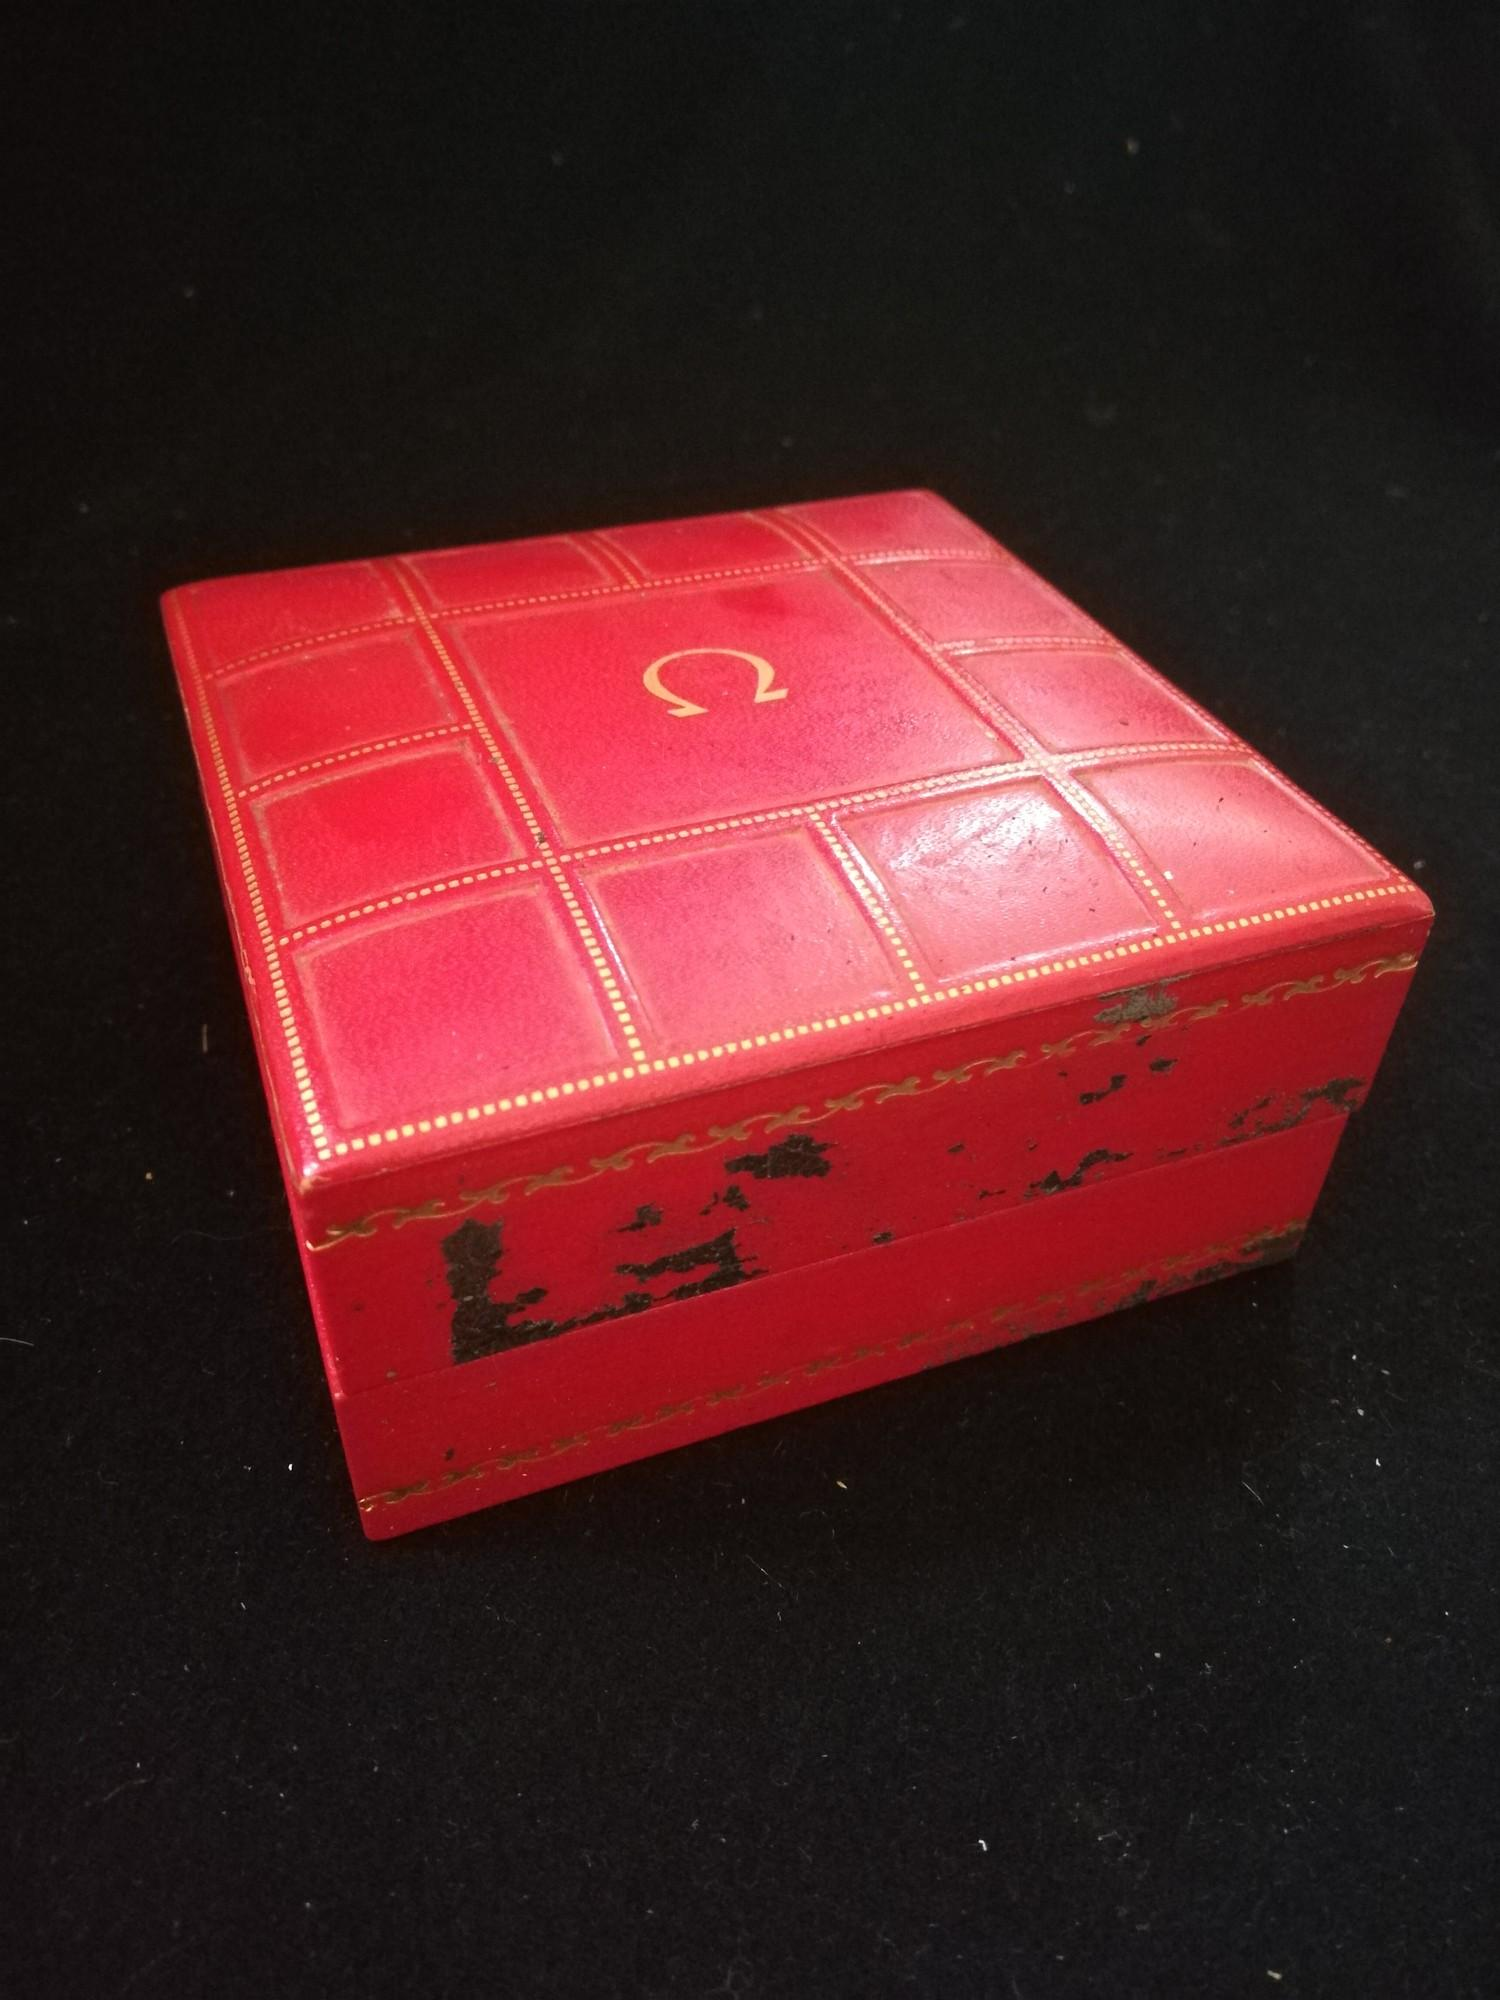 Vintage Omega high precision watch box